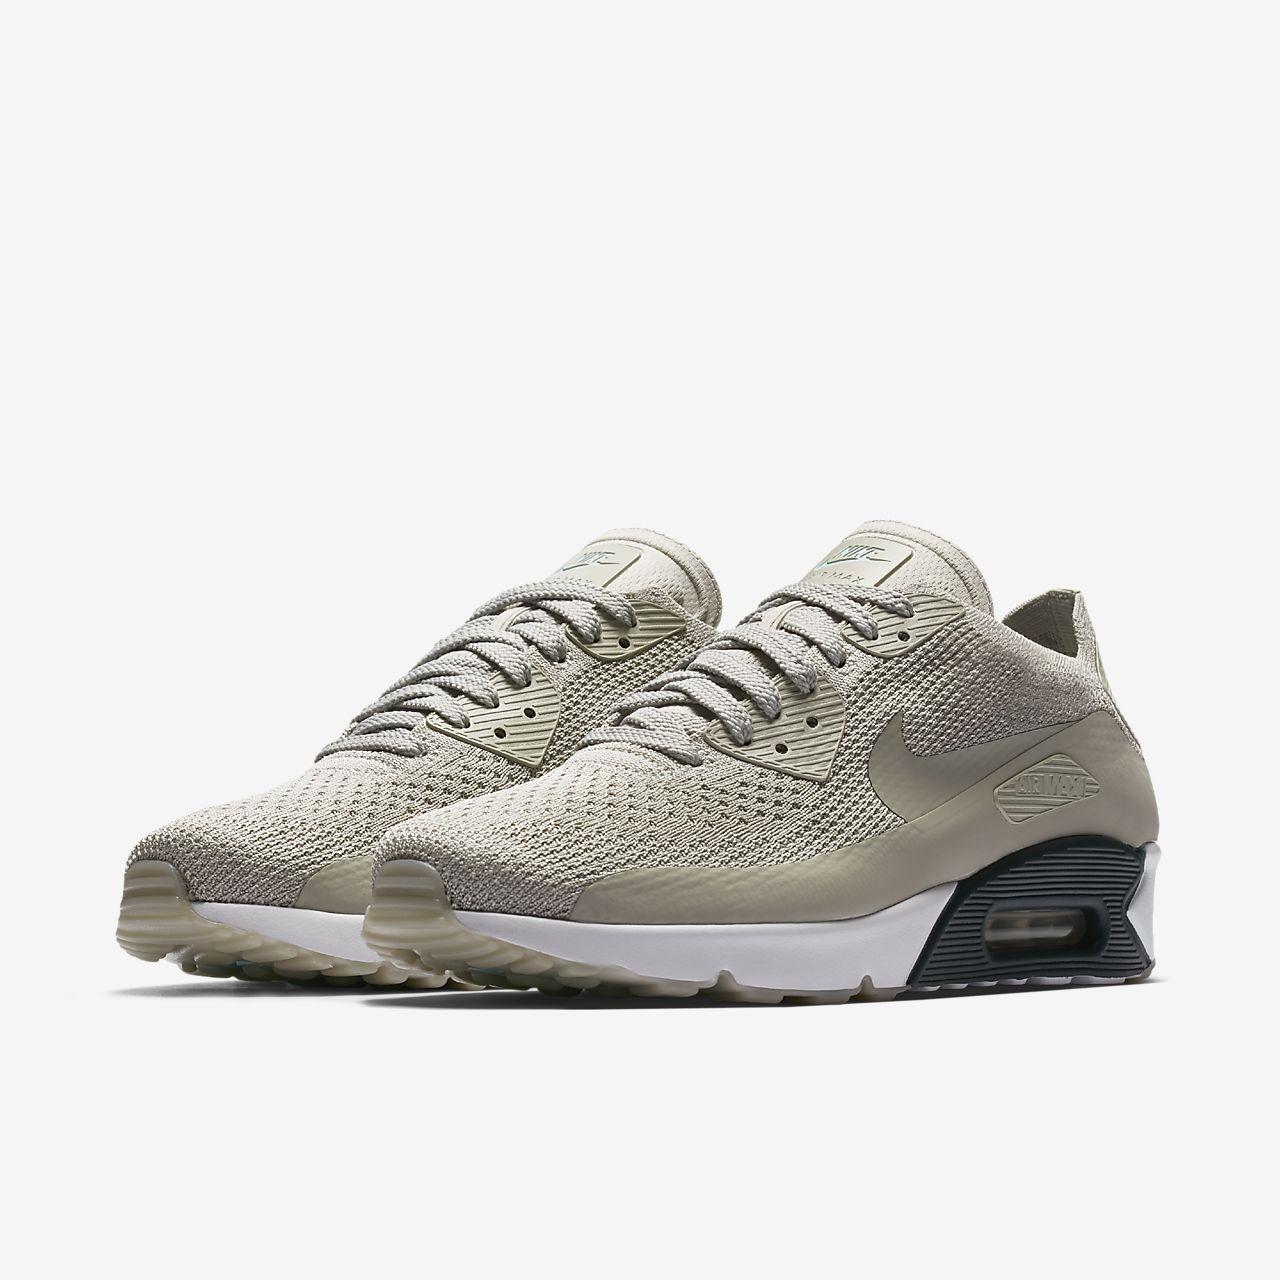 promo code 7eab1 7eddf Chaussure Nike Air Max 90 Ultra 2.0 Flyknit pour Homme ...